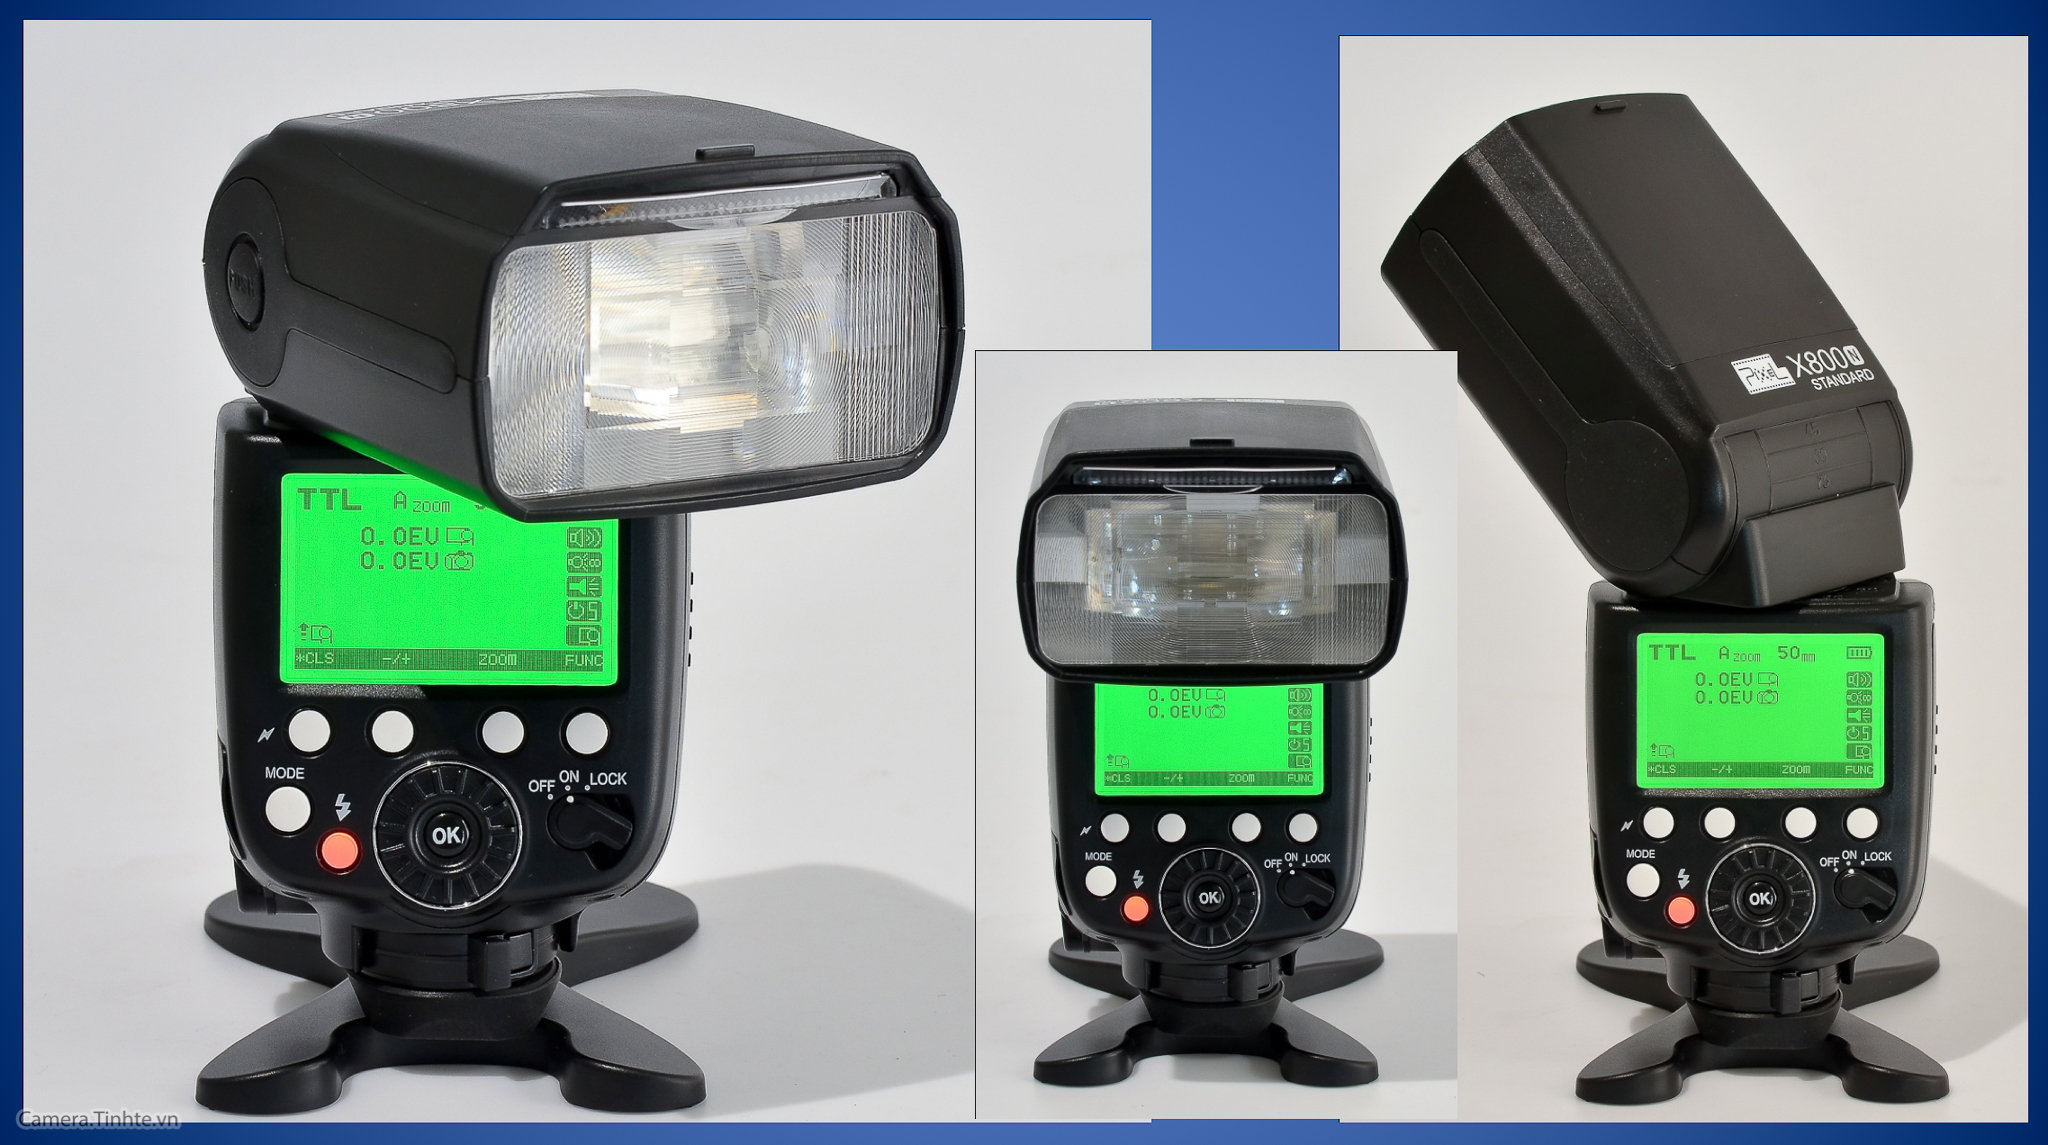 slide NACB 5 - Flash - Camera.tinhte.vn-1.jpg